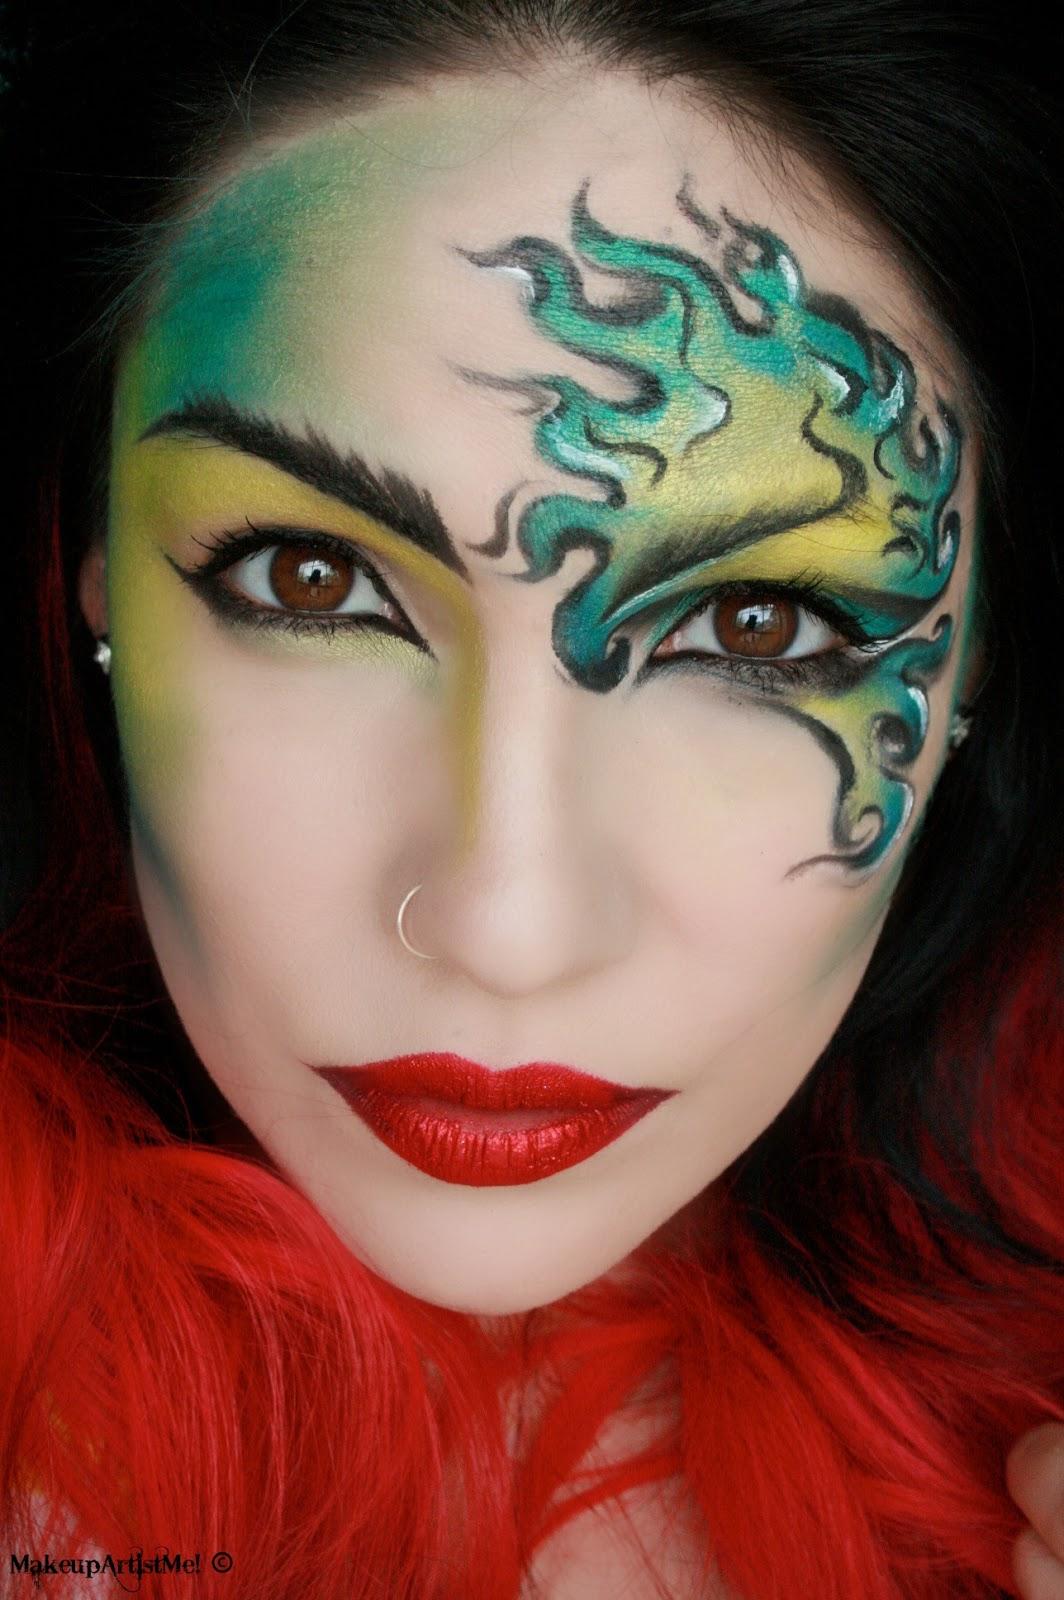 Makeup Artist Corina Ciobanu: Make-up Artist Me!: Viper